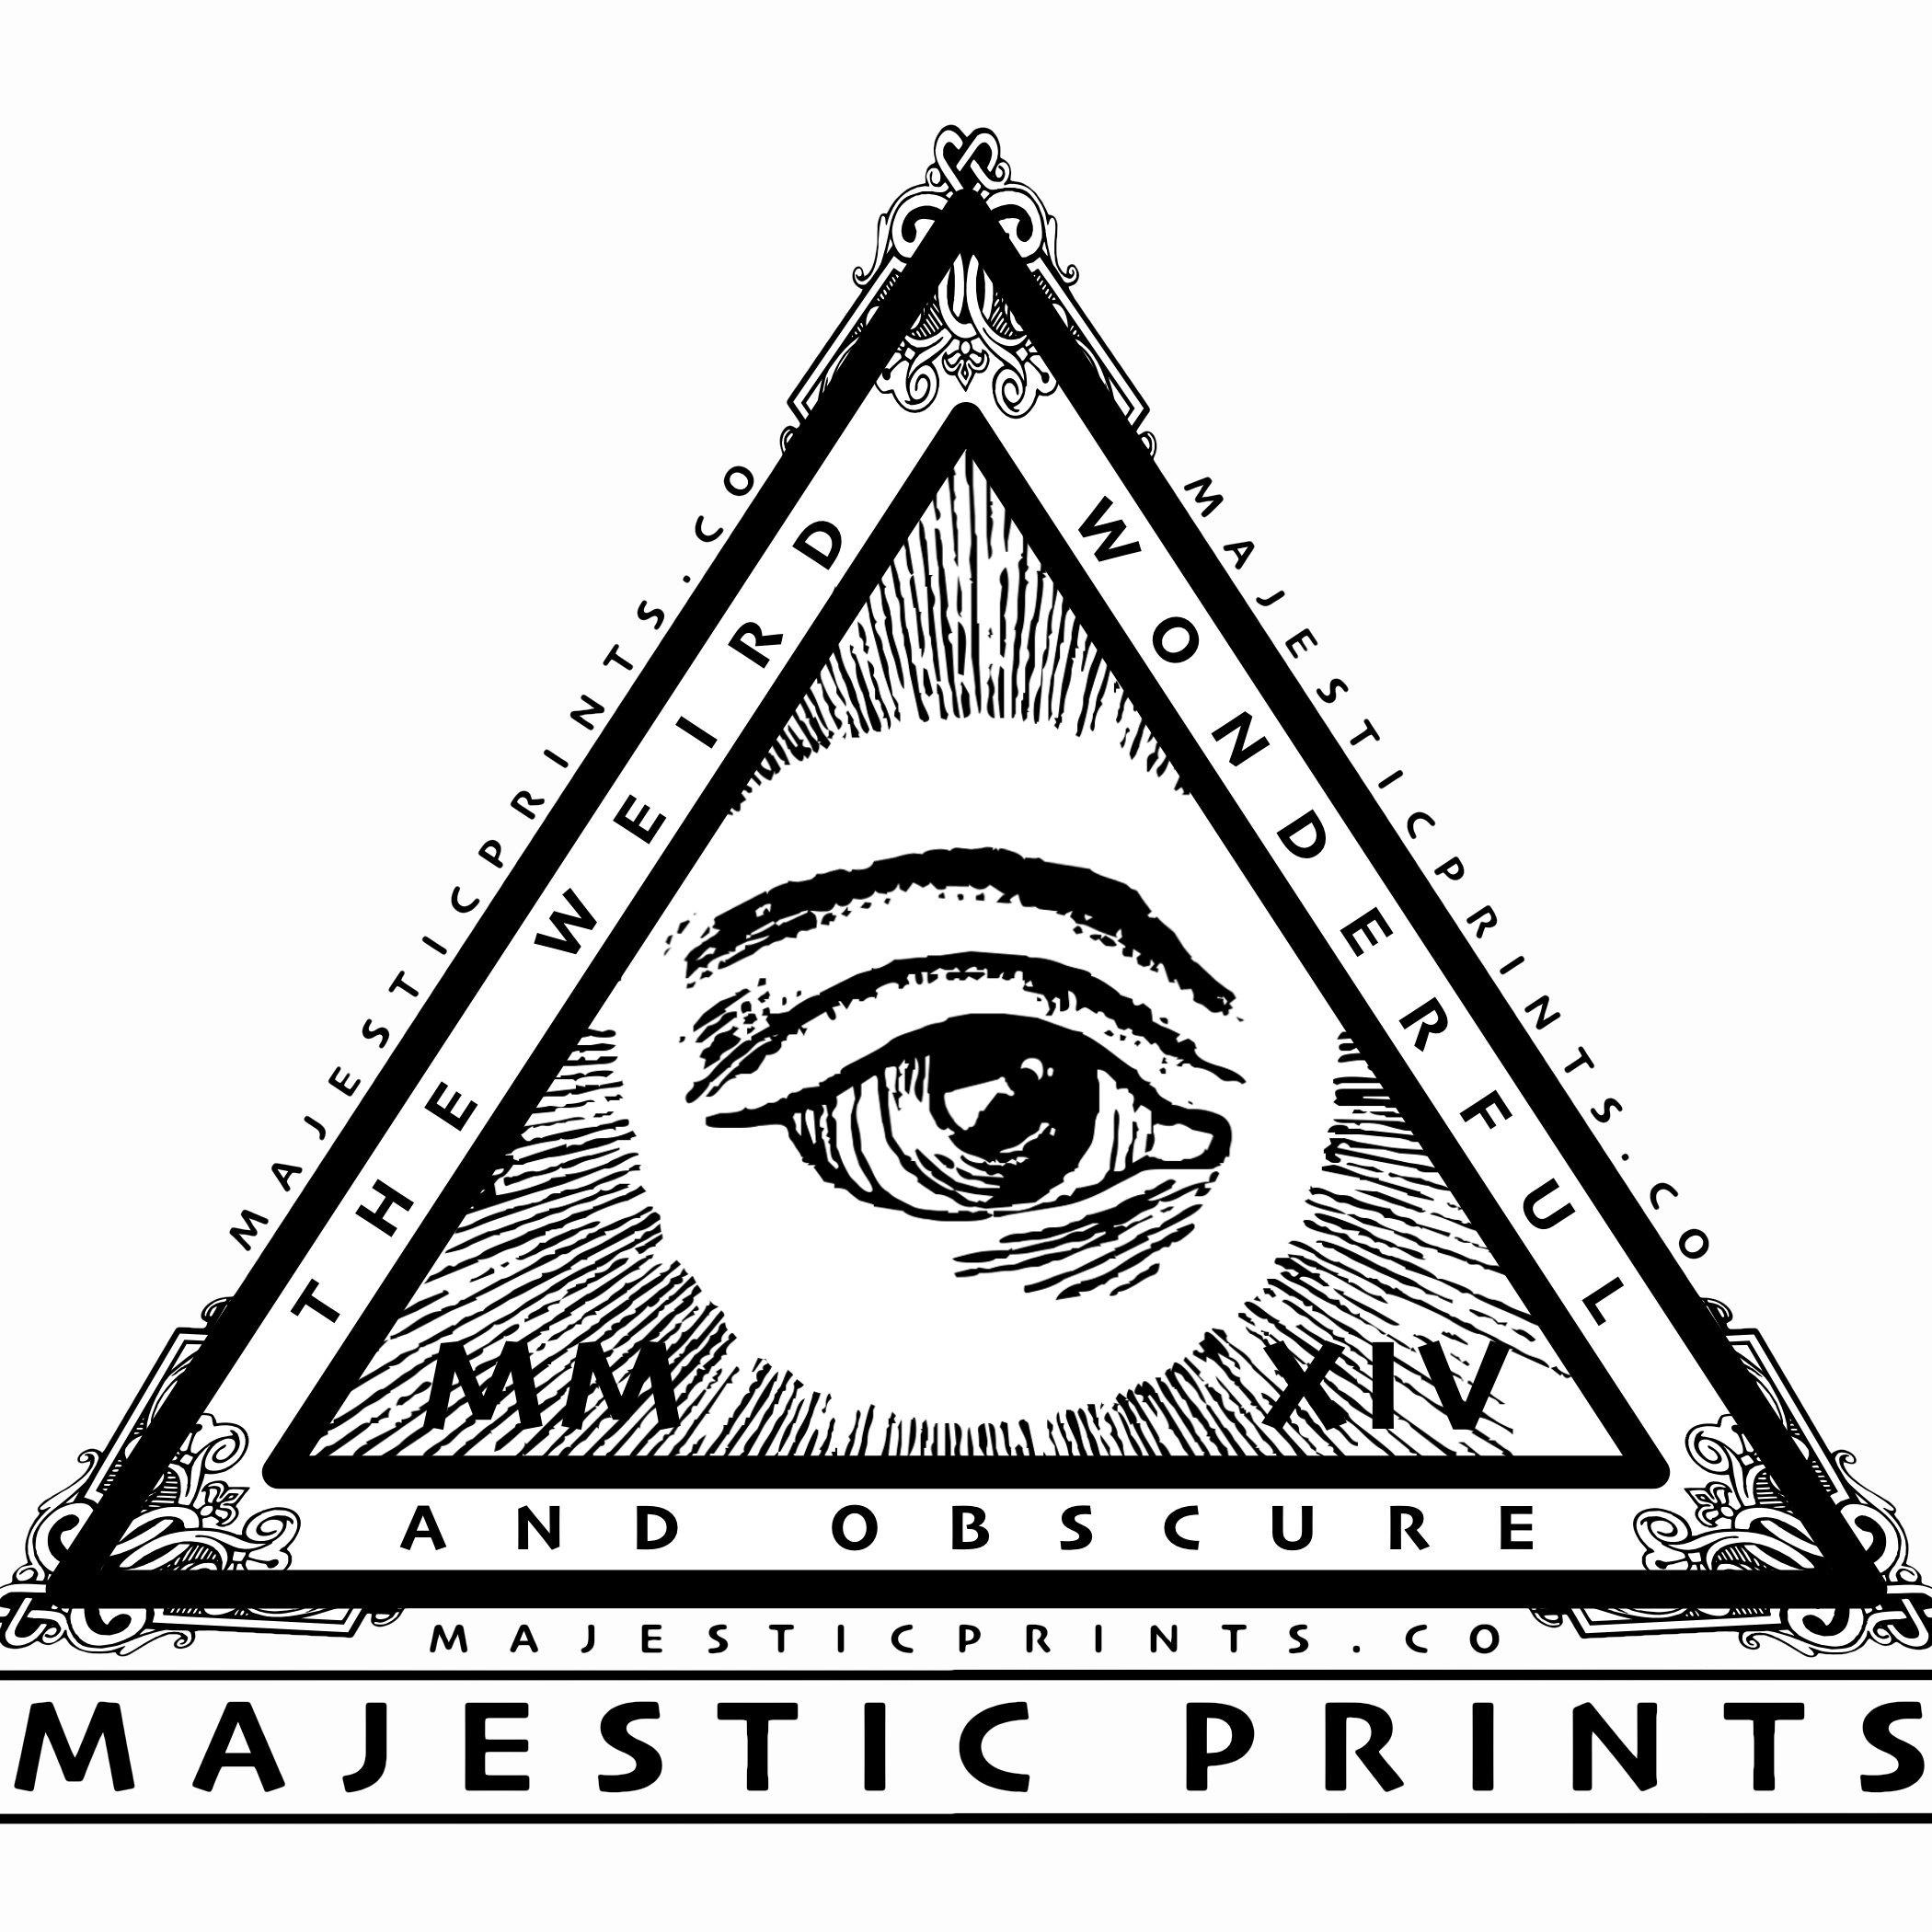 MajesticPrints